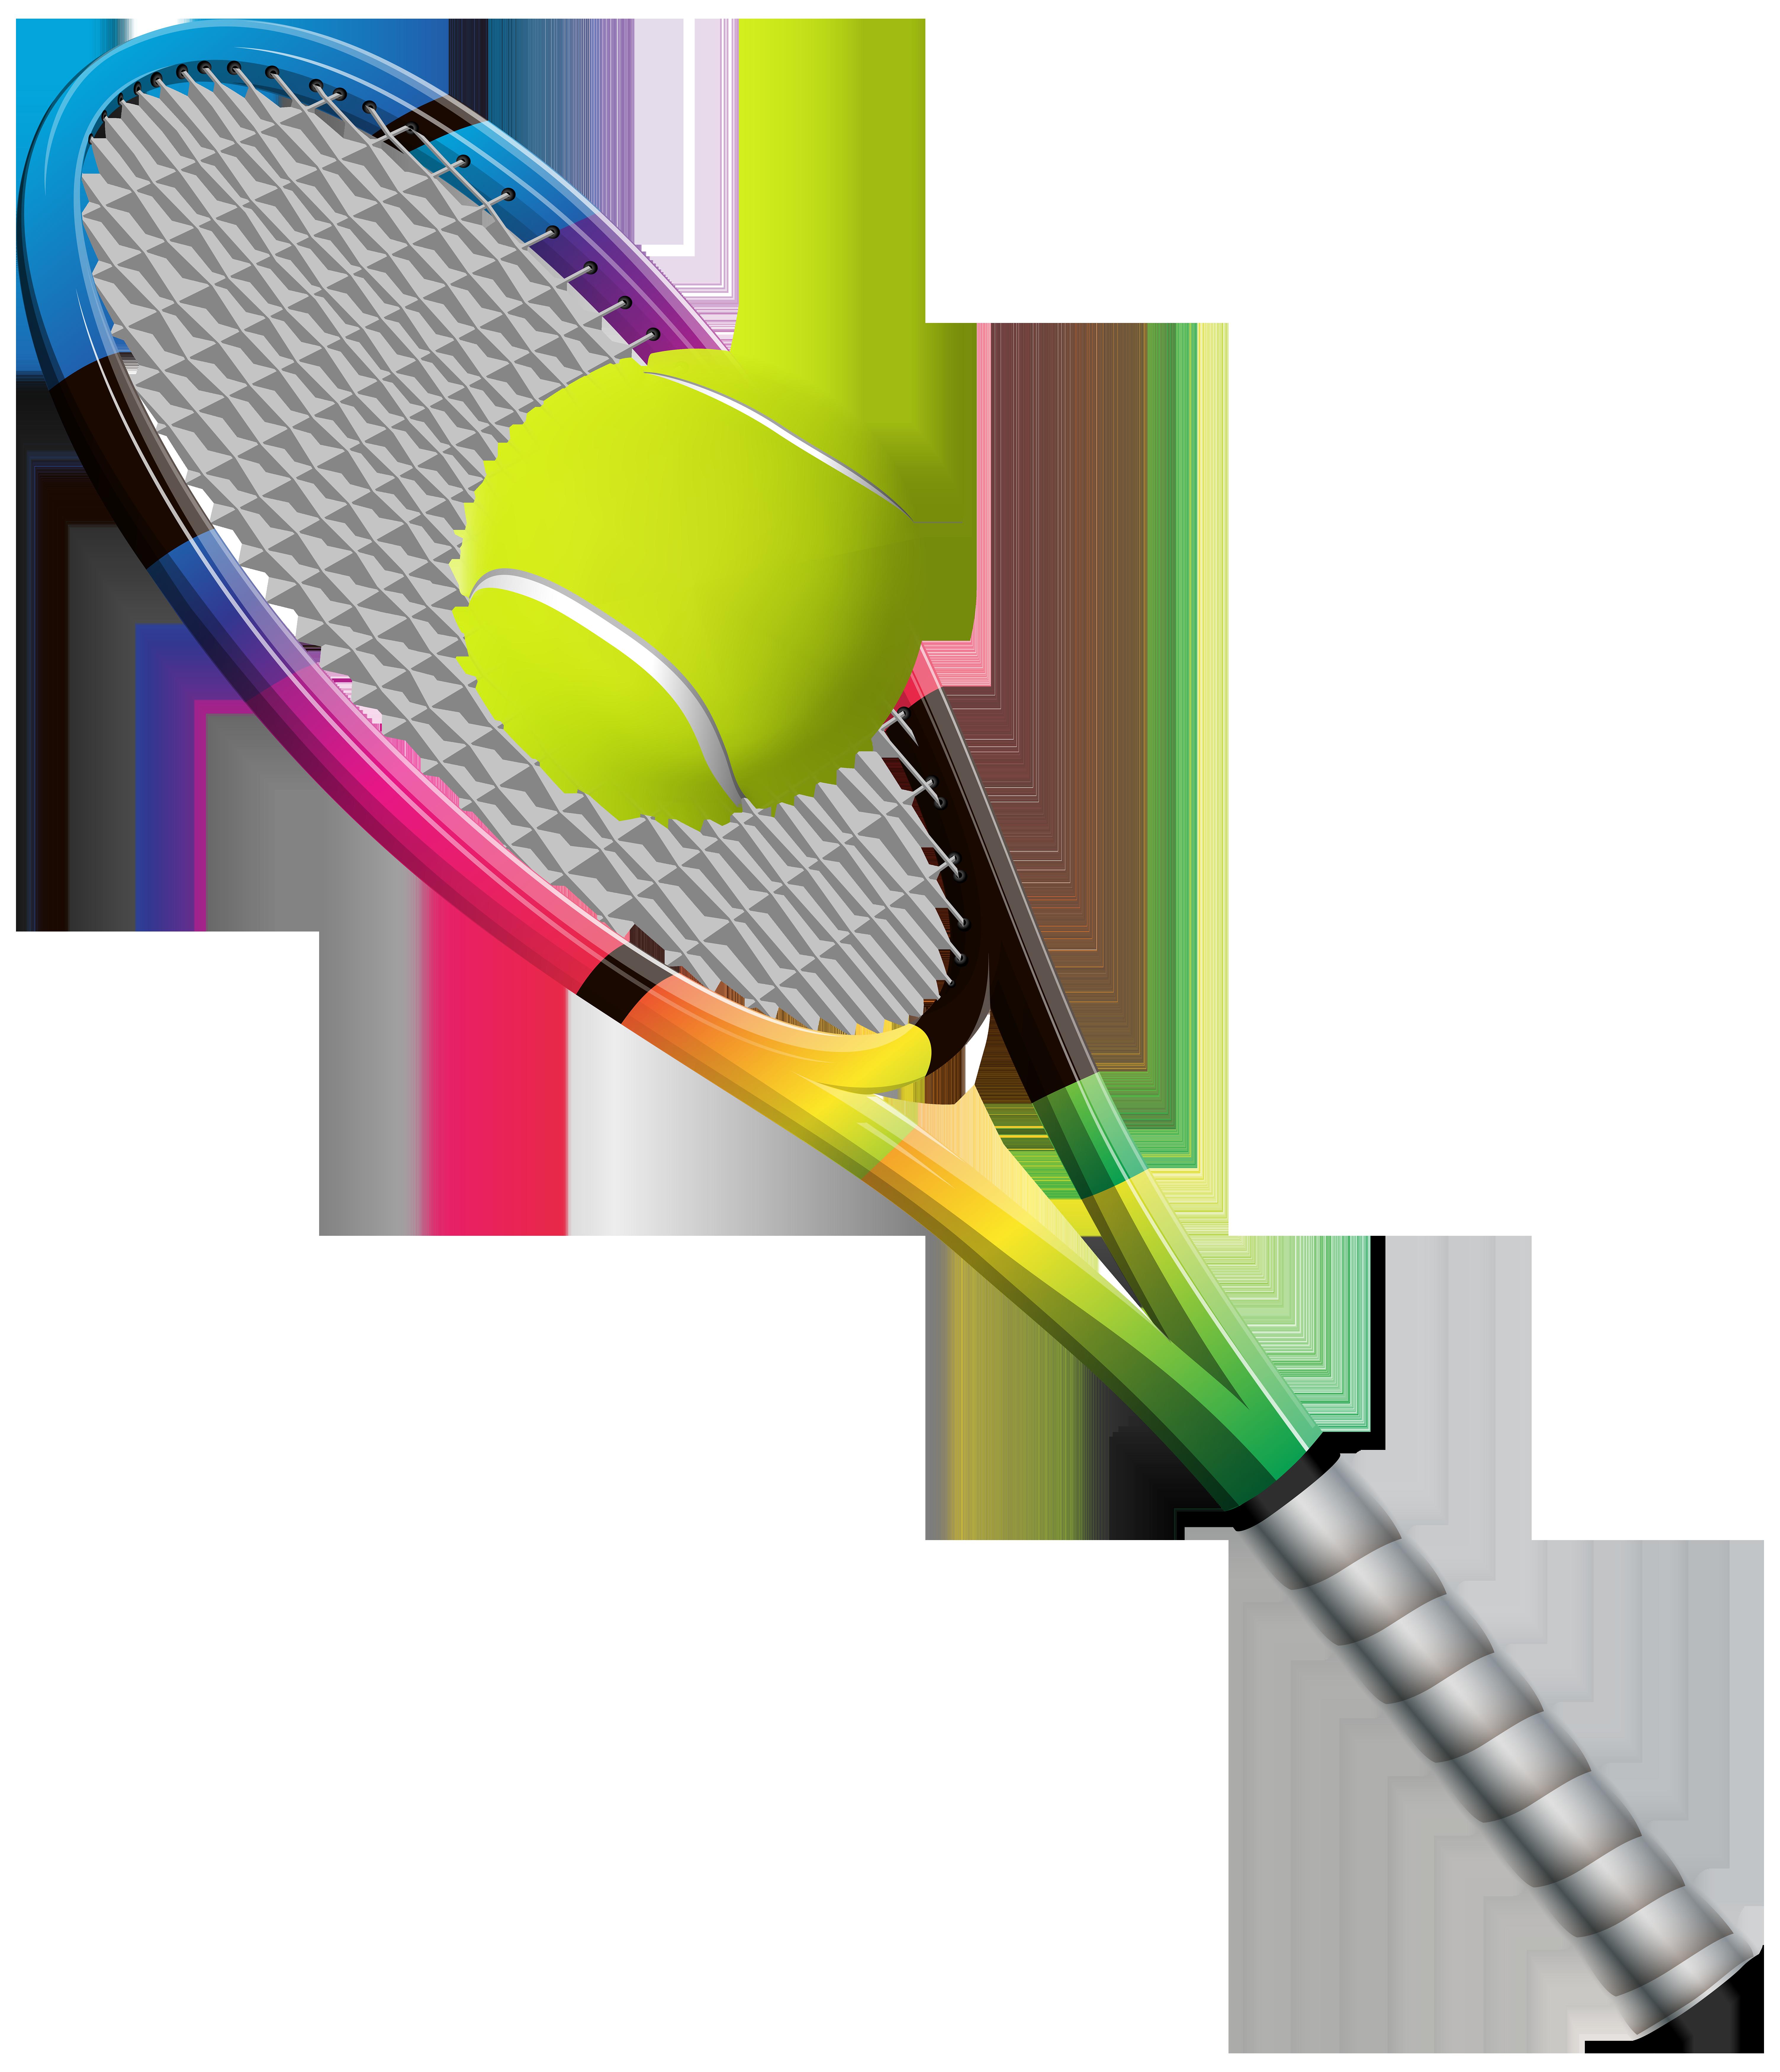 Men clipart tennis. Racket and ball transparent